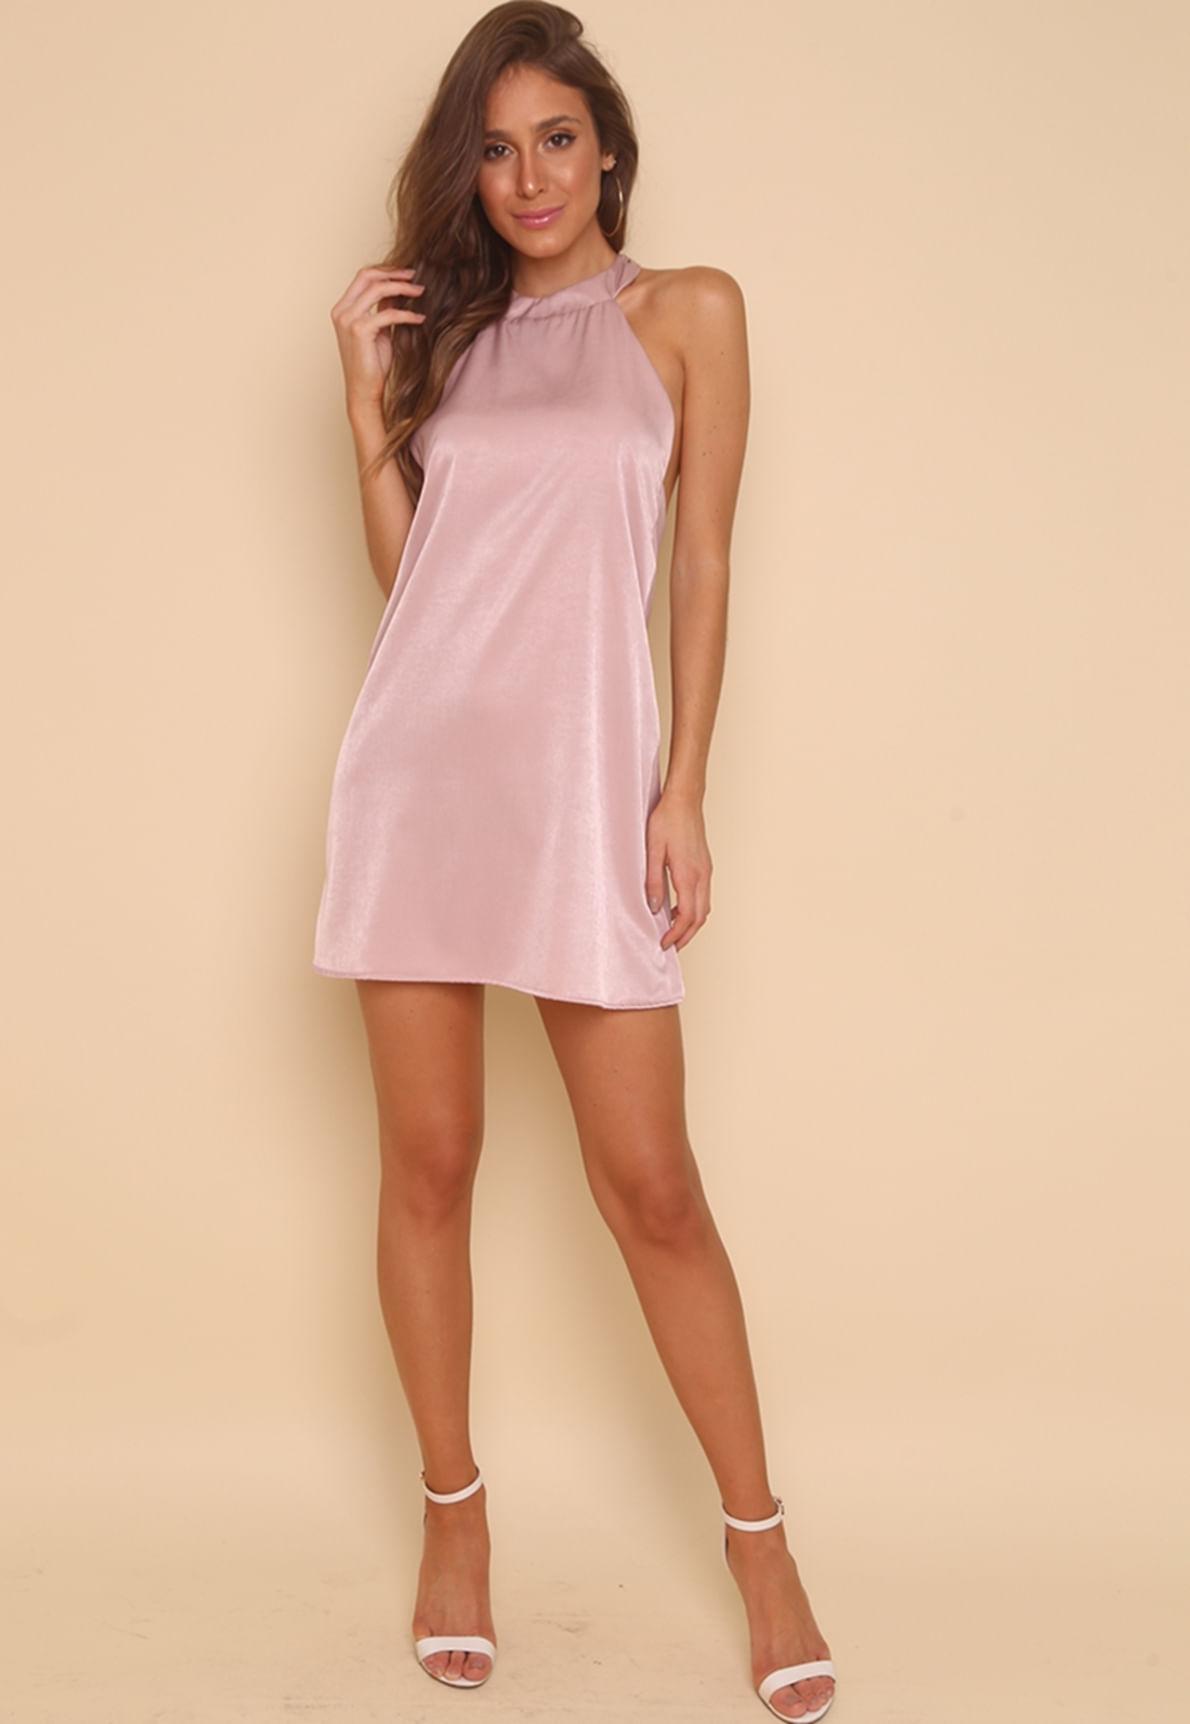 27451-vestido-rose-renata-mundo-lolita-02